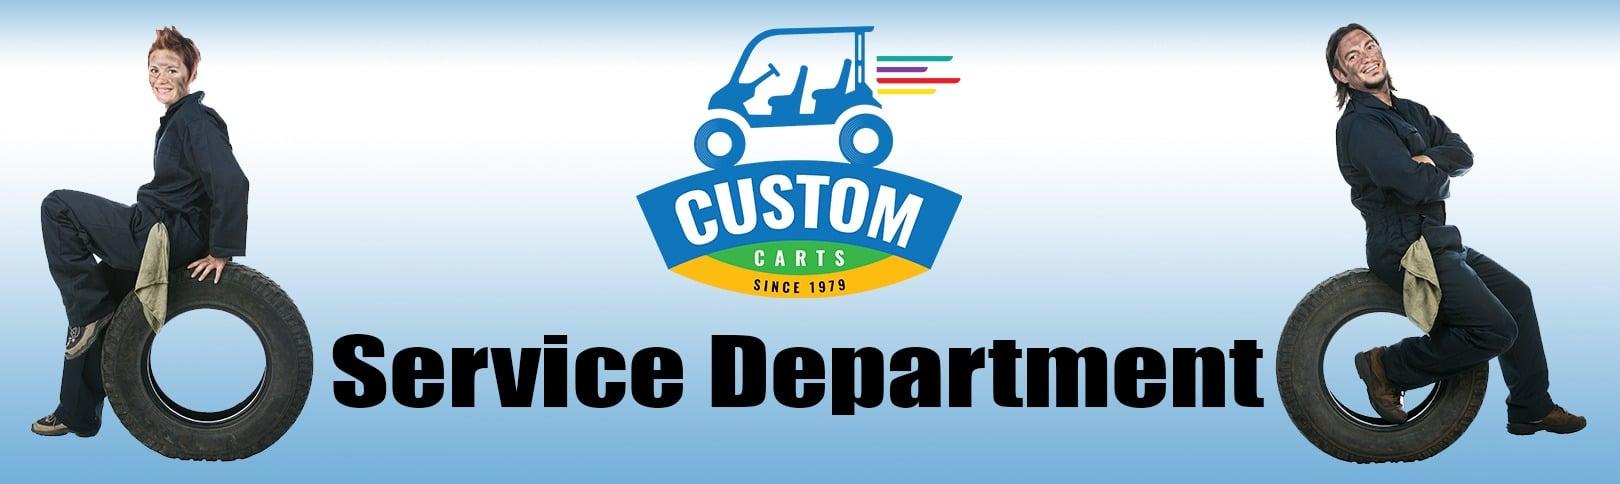 Service Department at Custom Carts